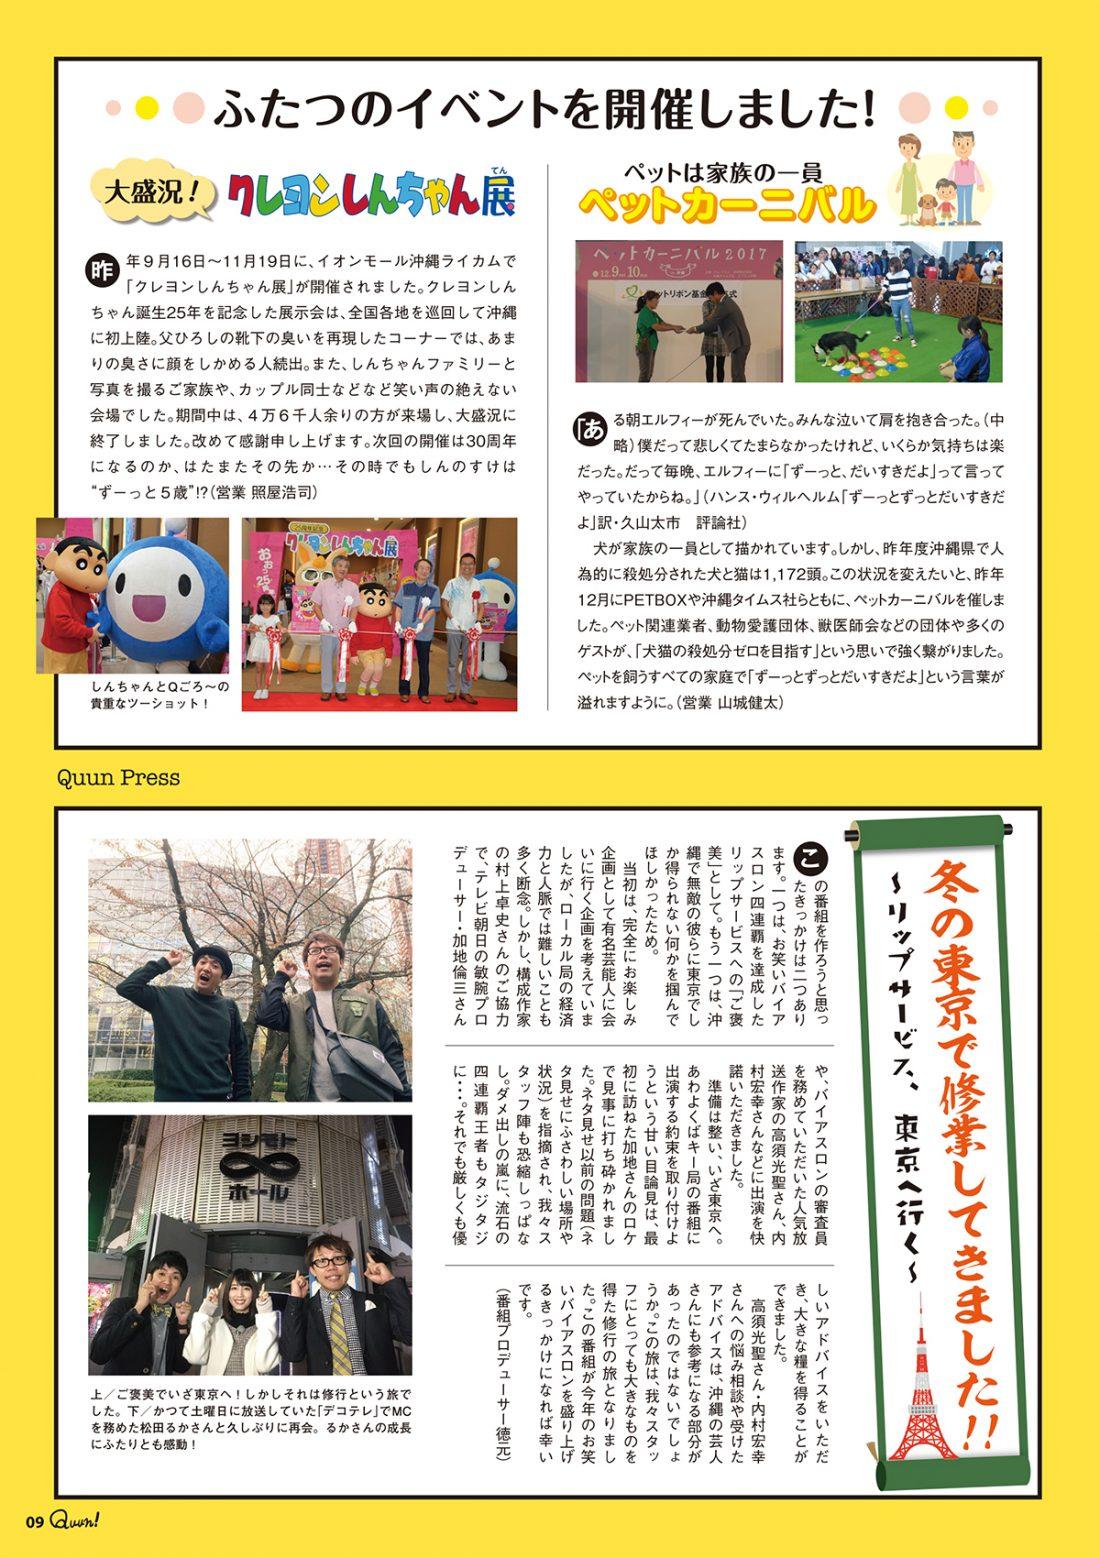 https://www.qab.co.jp/qgoro/wp-content/uploads/quun_0911-1100x1558.jpg